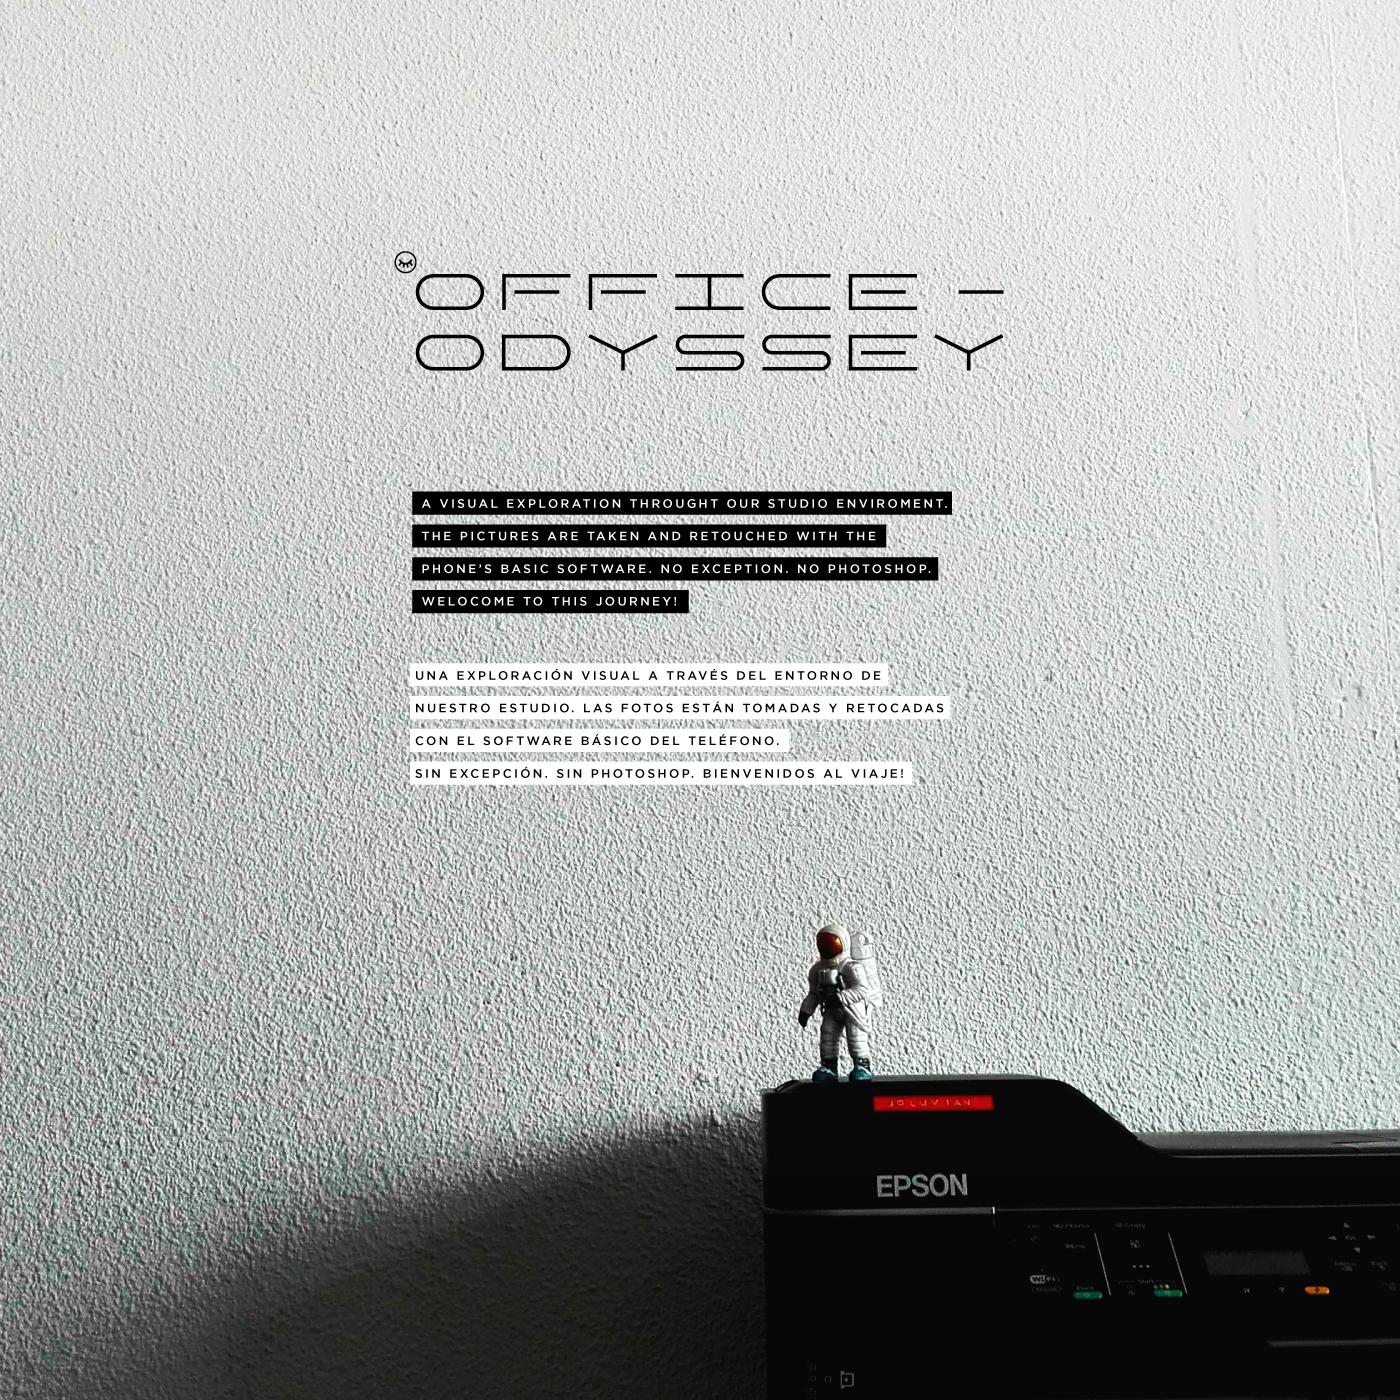 Office odyssey,cosmos,astronaut,odyssey